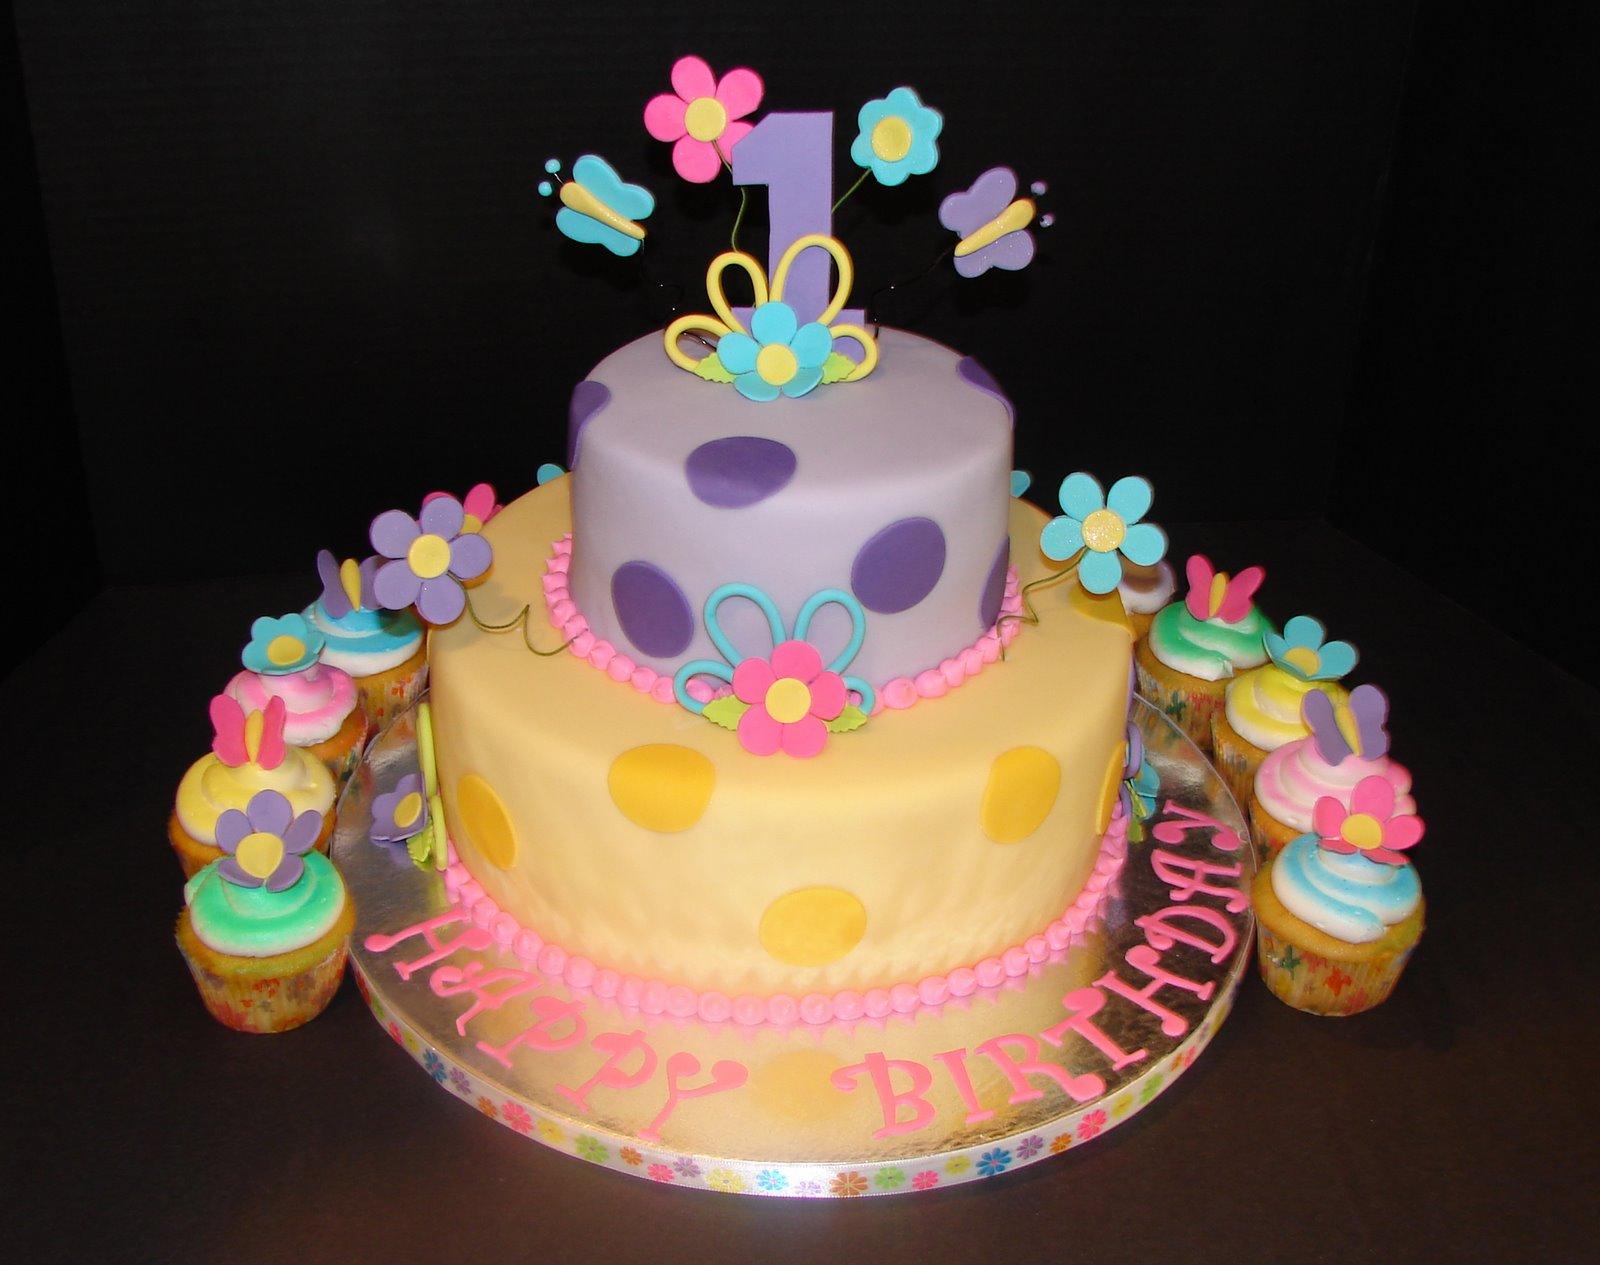 Girl first birthday cake clipart jpg library Girl first birthday cake clipart - ClipartFest jpg library